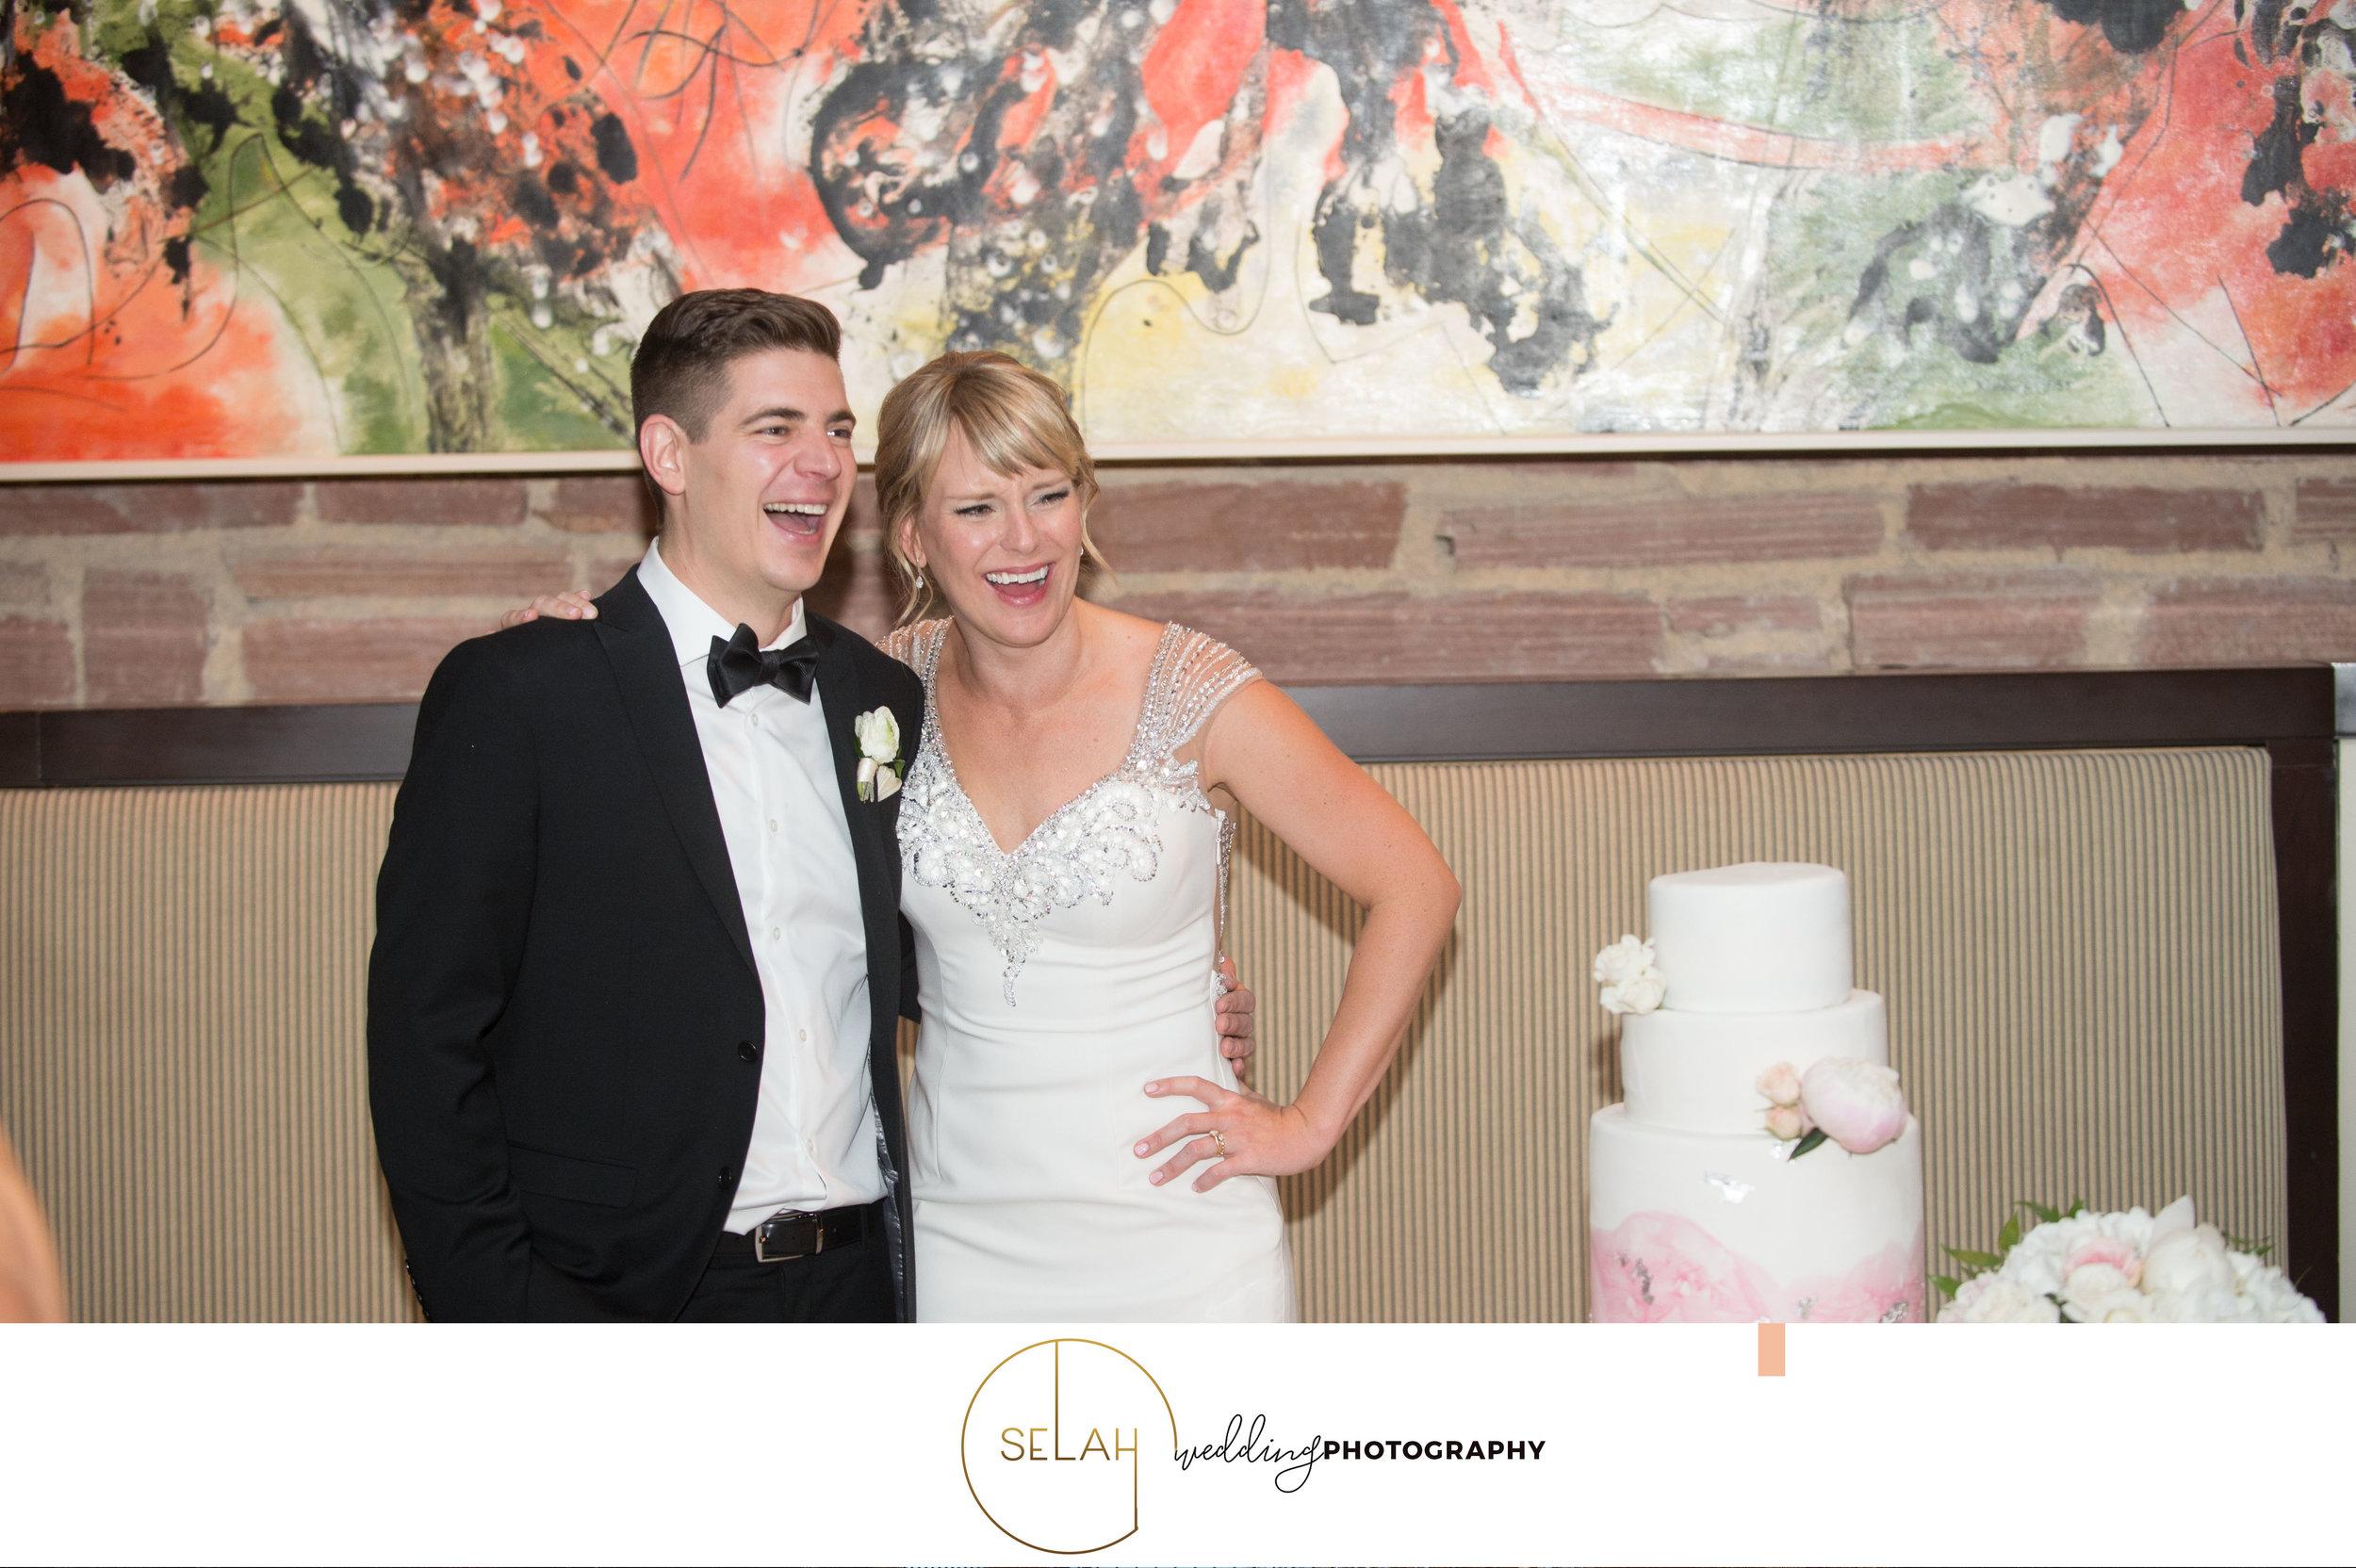 kevin-taylors-opera-house-wedding0010.jpg